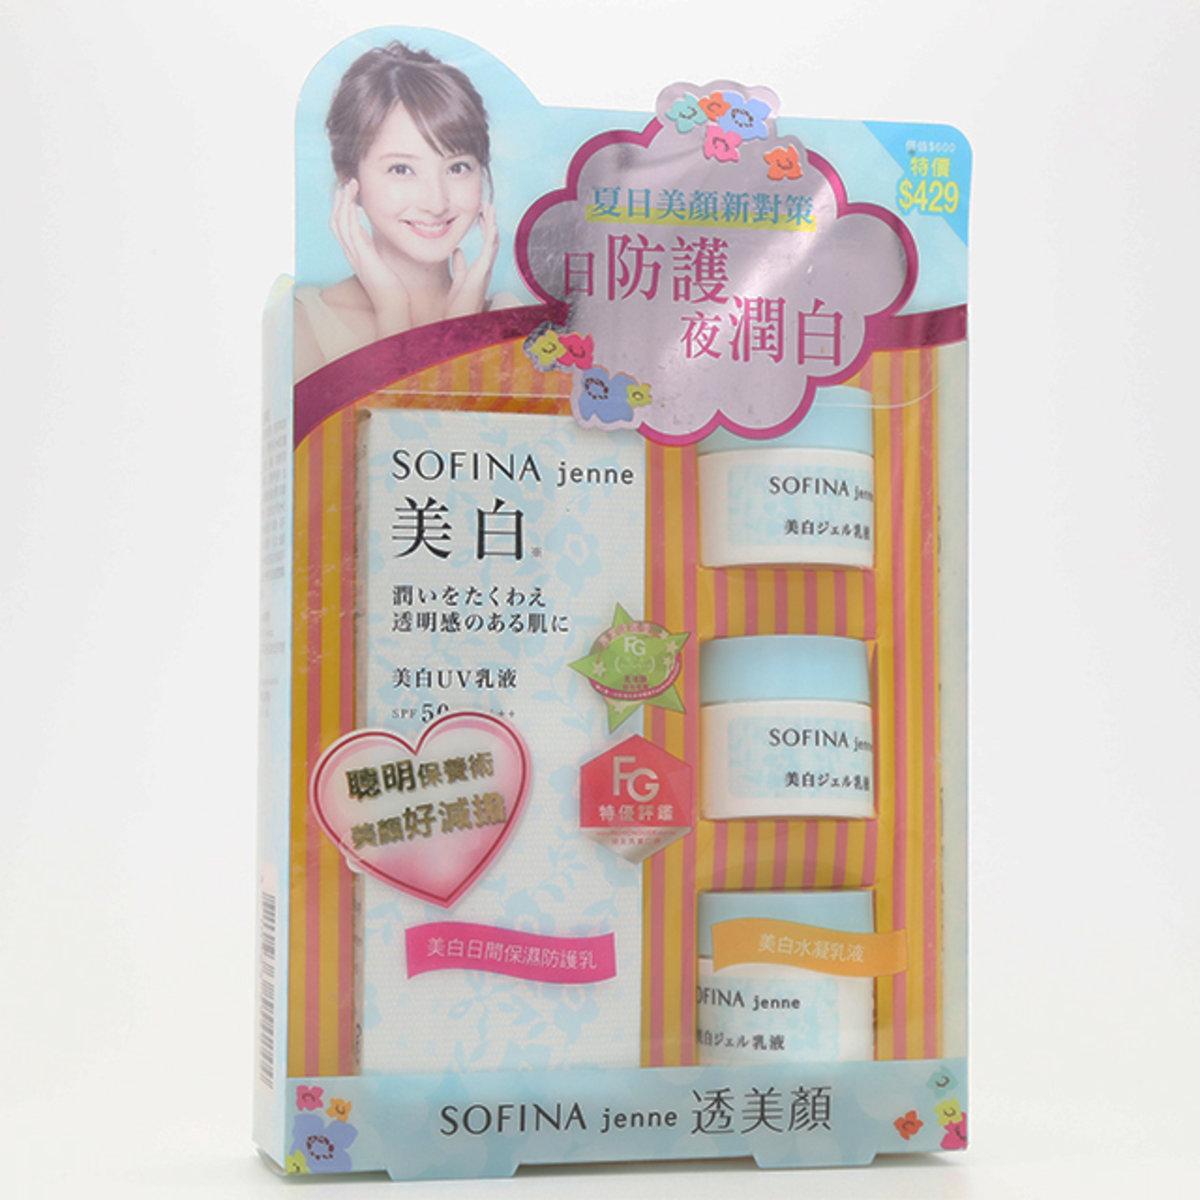 【4pcs】 jenna Whitening moisturizing Set (UV Cut SPF50 + Whitening Jelly Moisturizer) (Taiwan Version) -[Parallel Import Product]